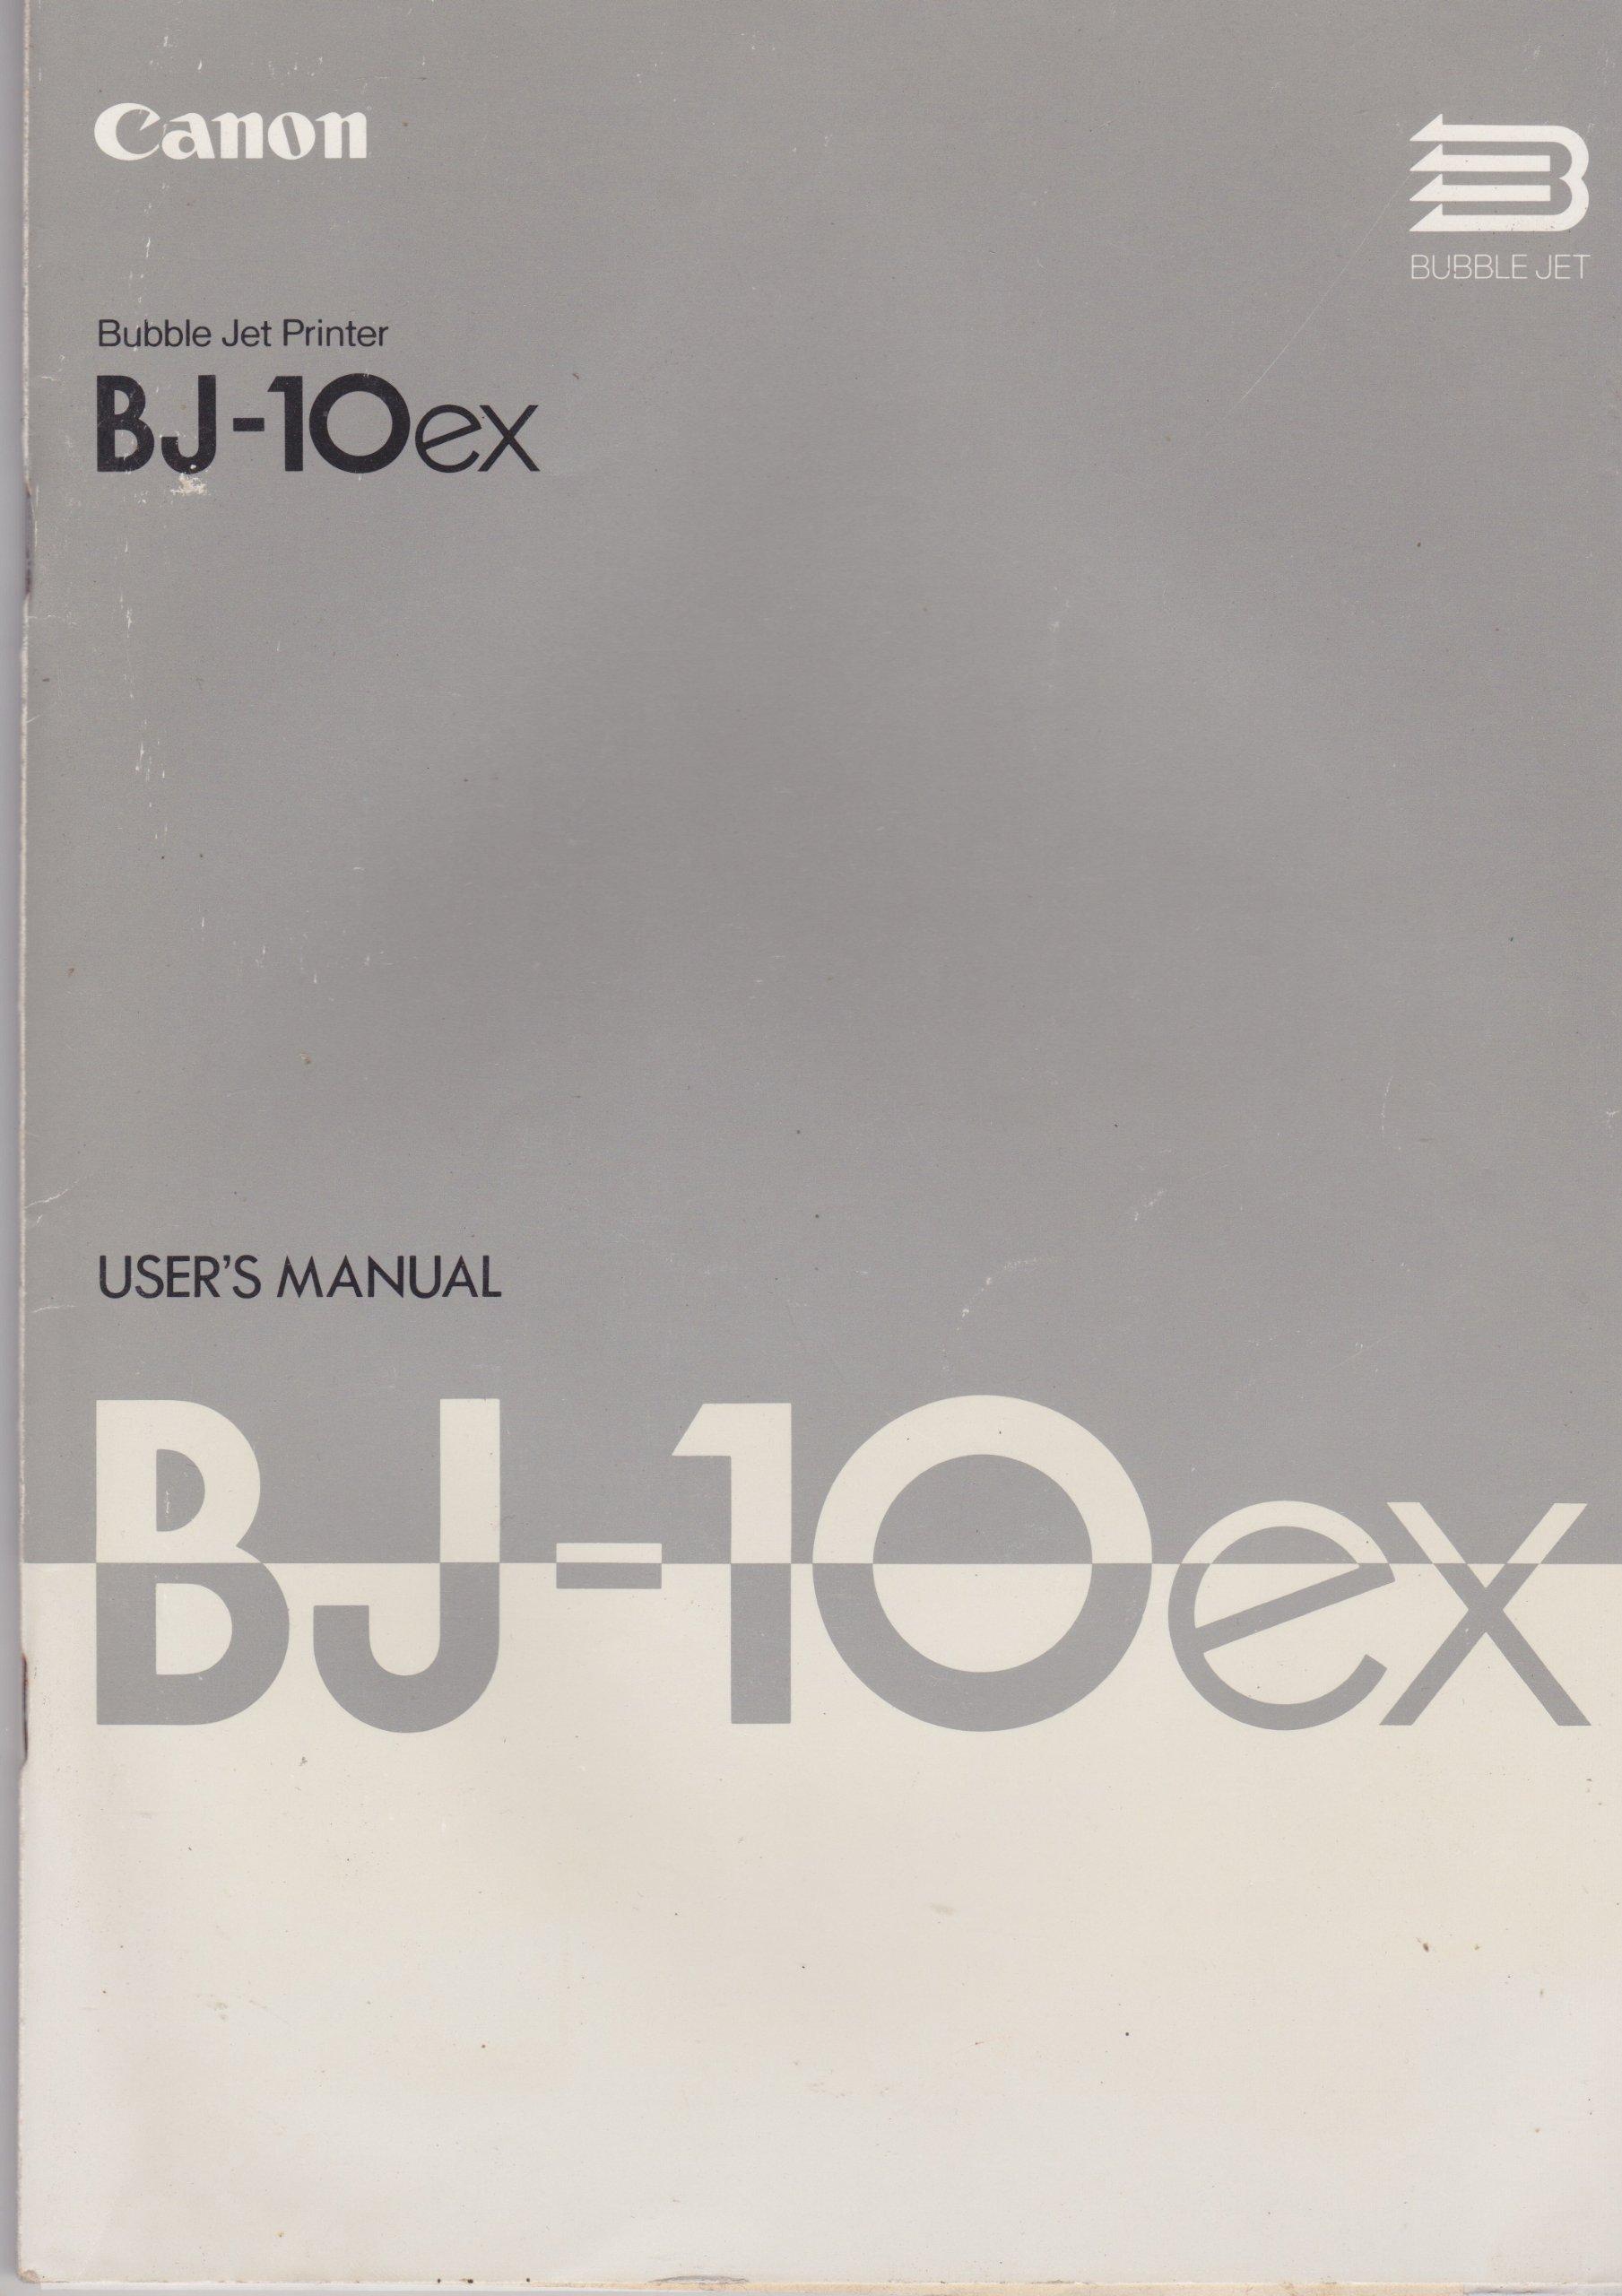 Canon BJ-10ex Bubblejet Printer User's Manual: Amazon.co.uk: Canon: Books